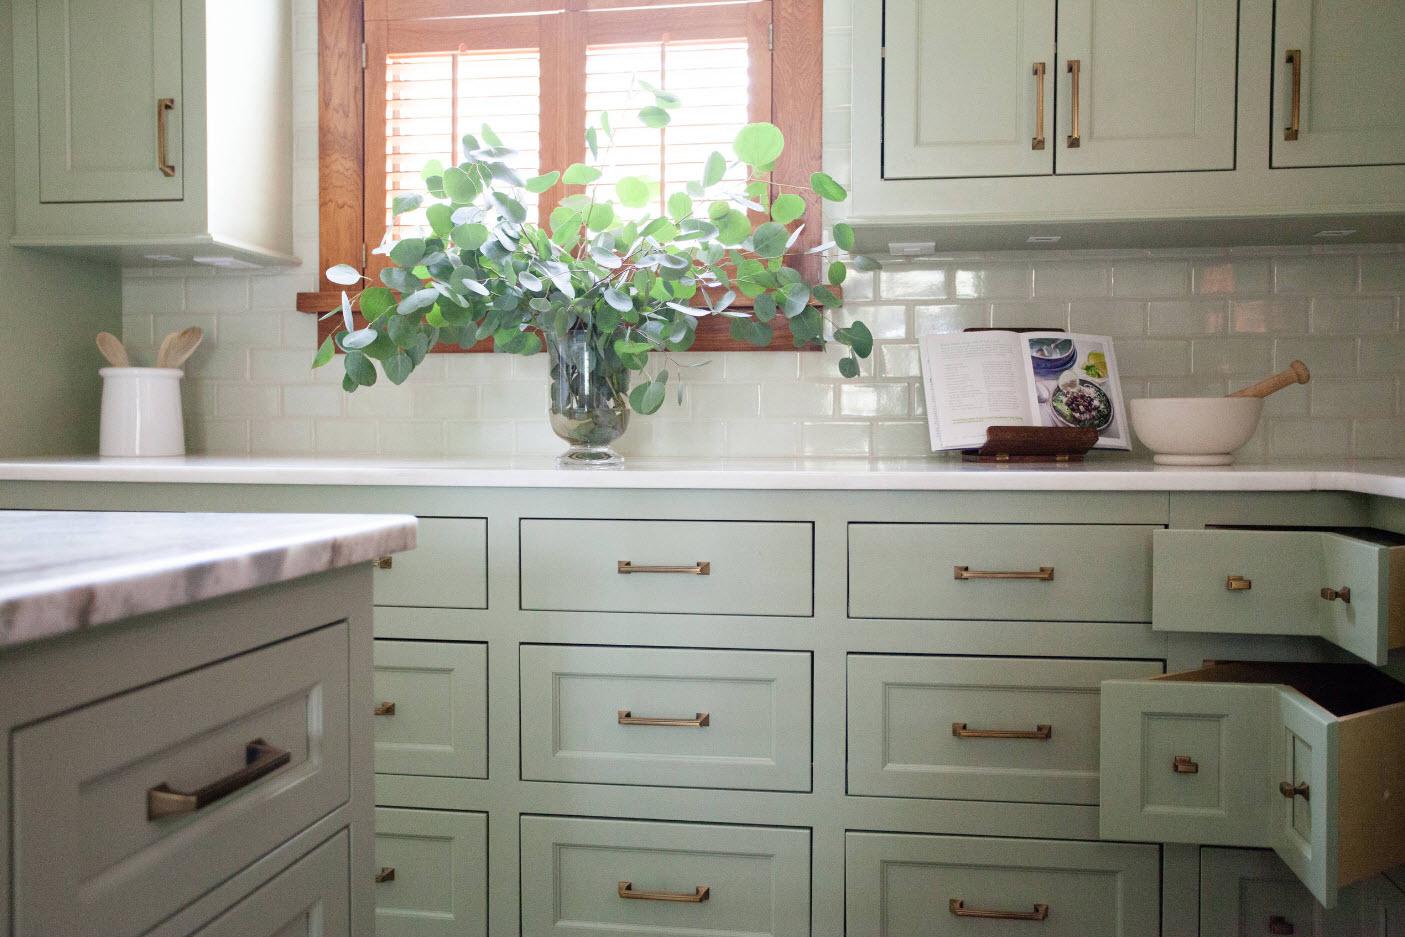 Angular Kitchen Layout Design Ideas 2017. Uniform pale green storage system in classic style